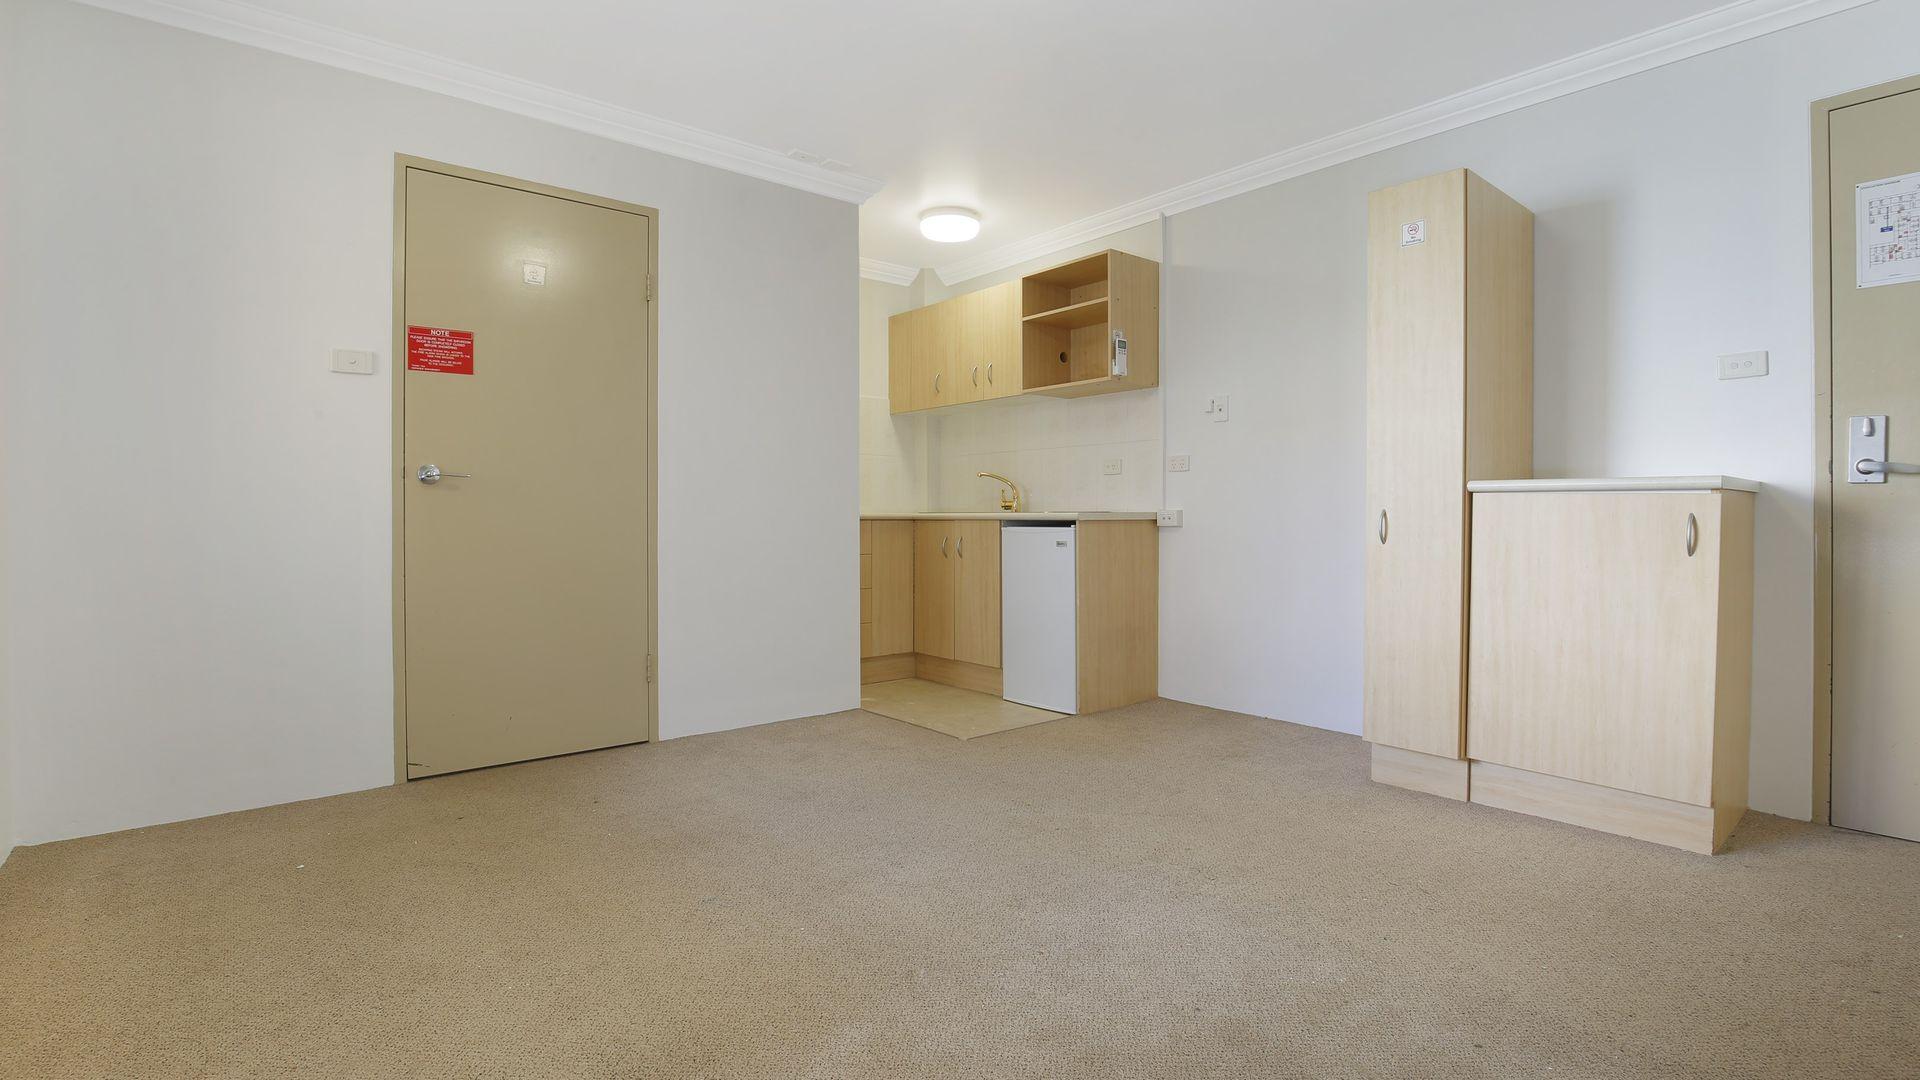 75-79 Keira Street, Wollongong NSW 2500, Image 1